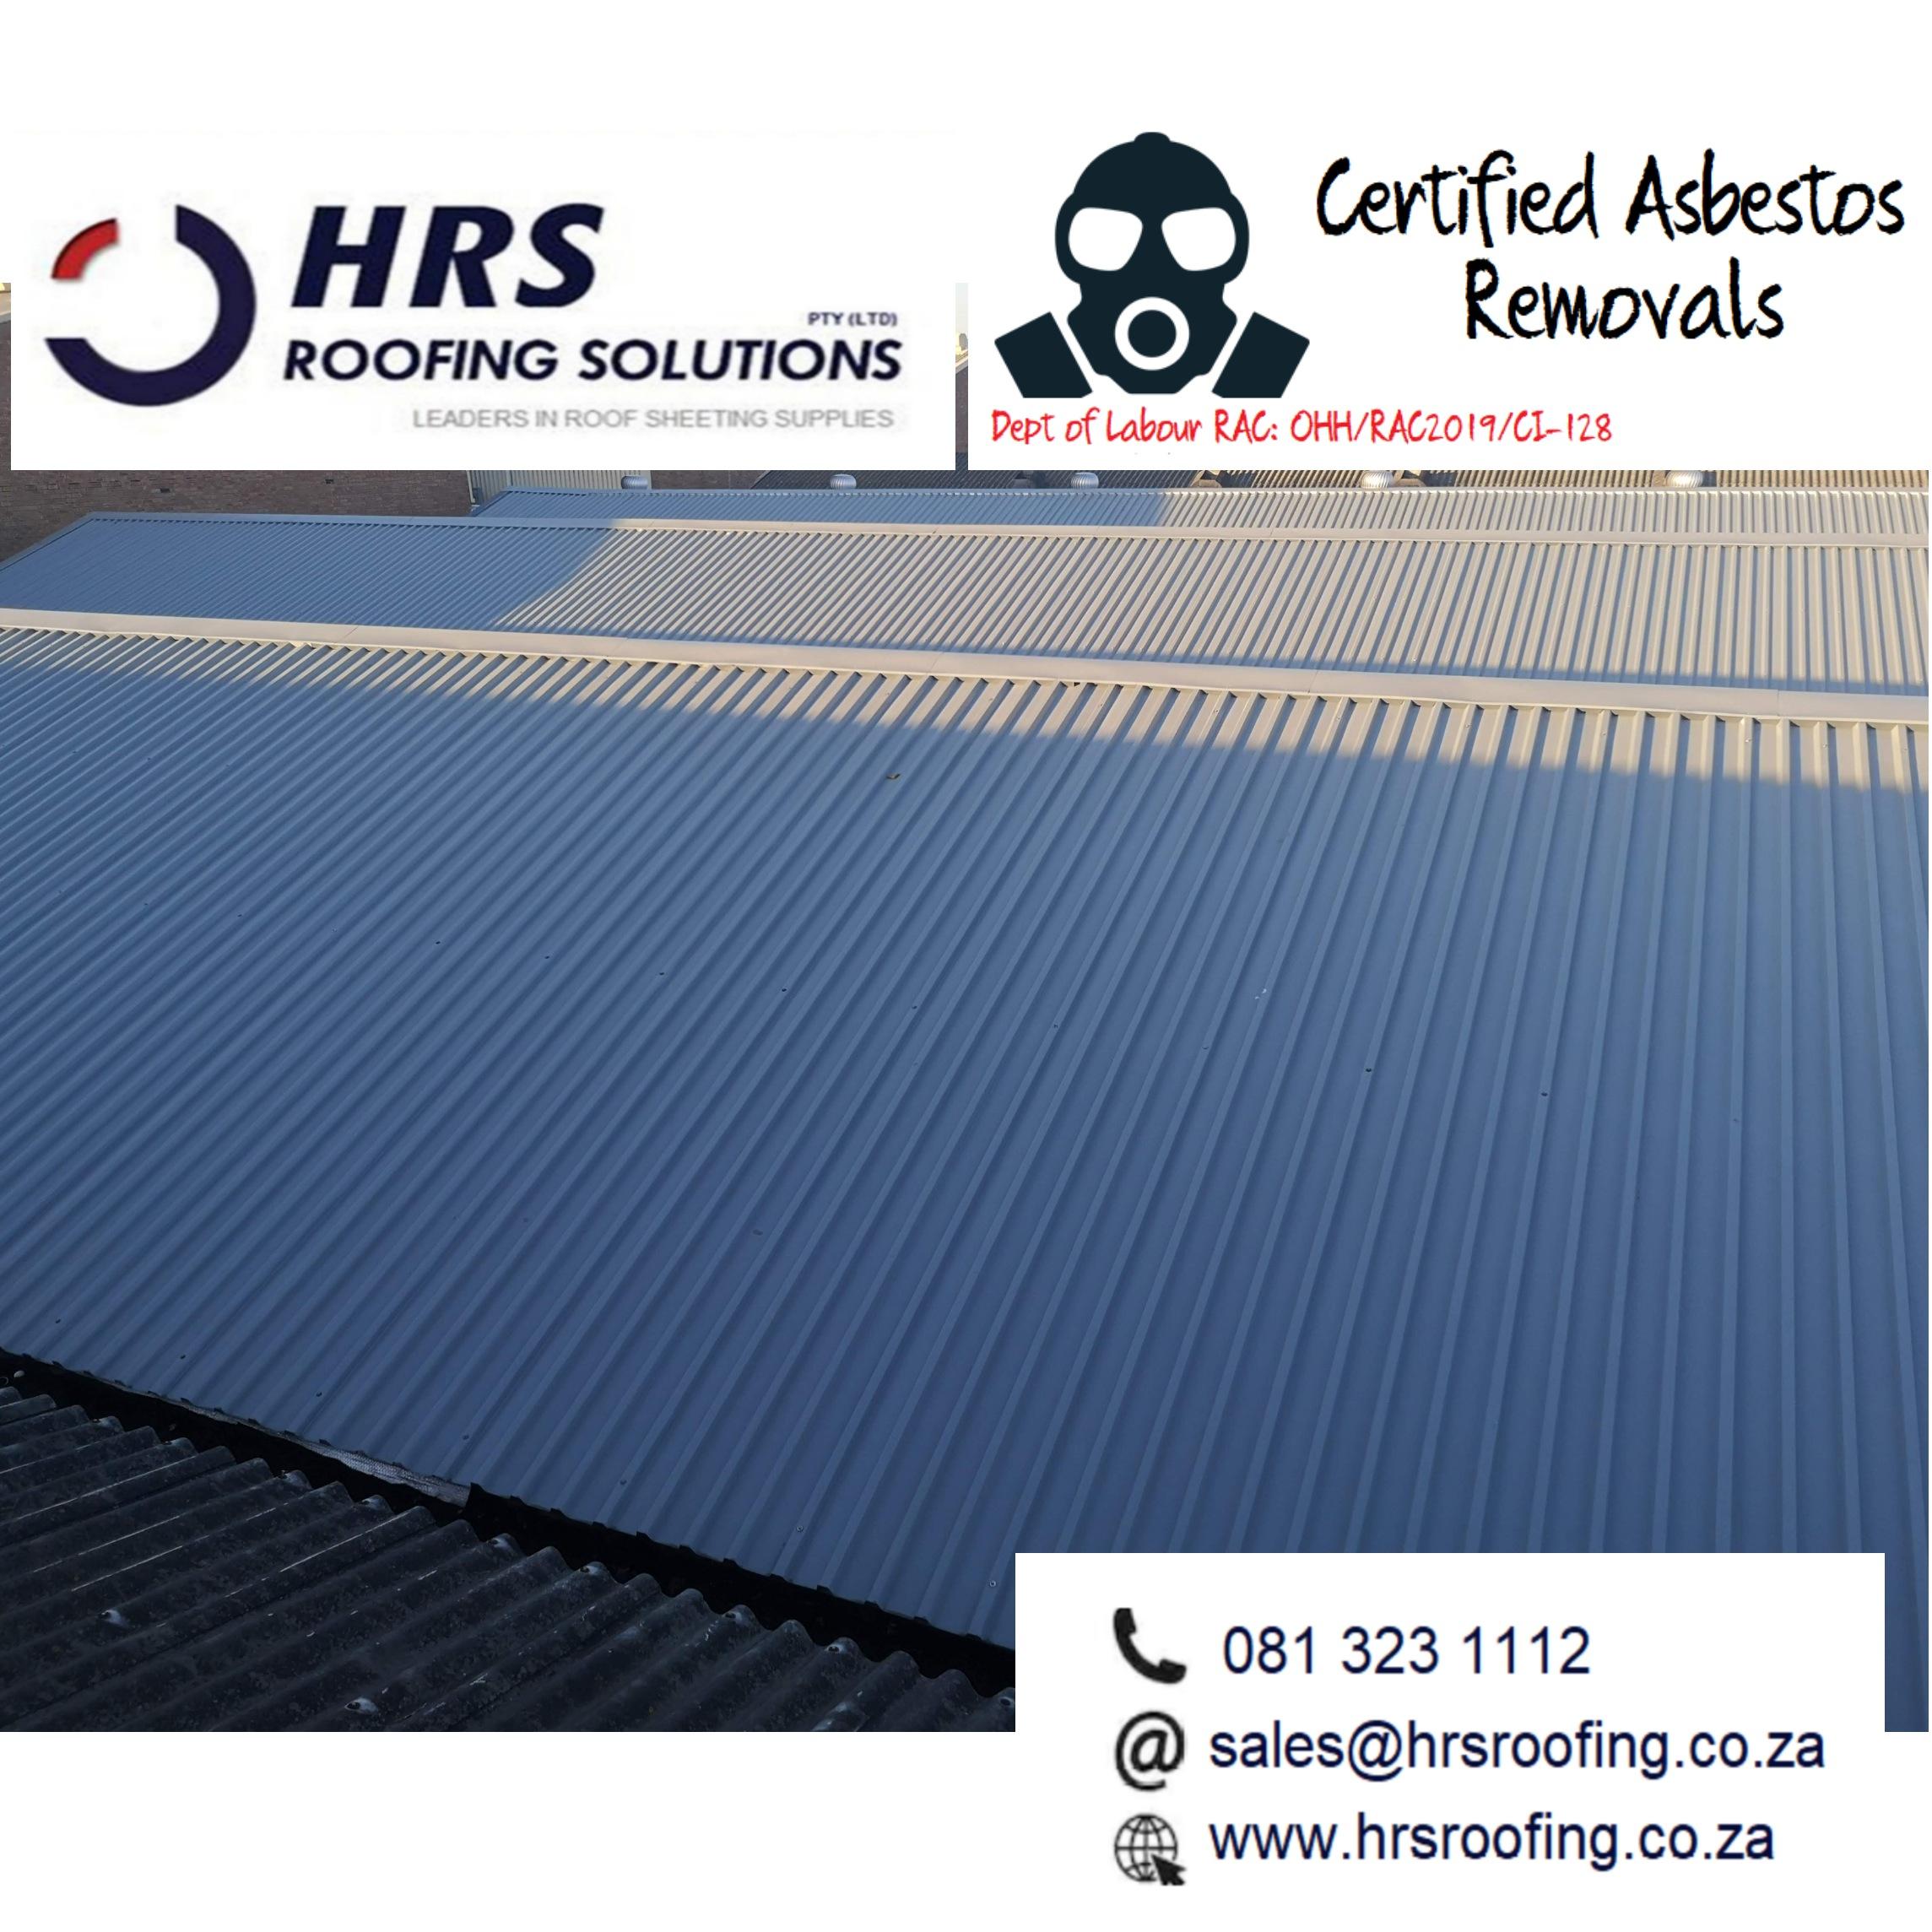 PicsArt 08 09 10.23.49 - Roofing Gallery